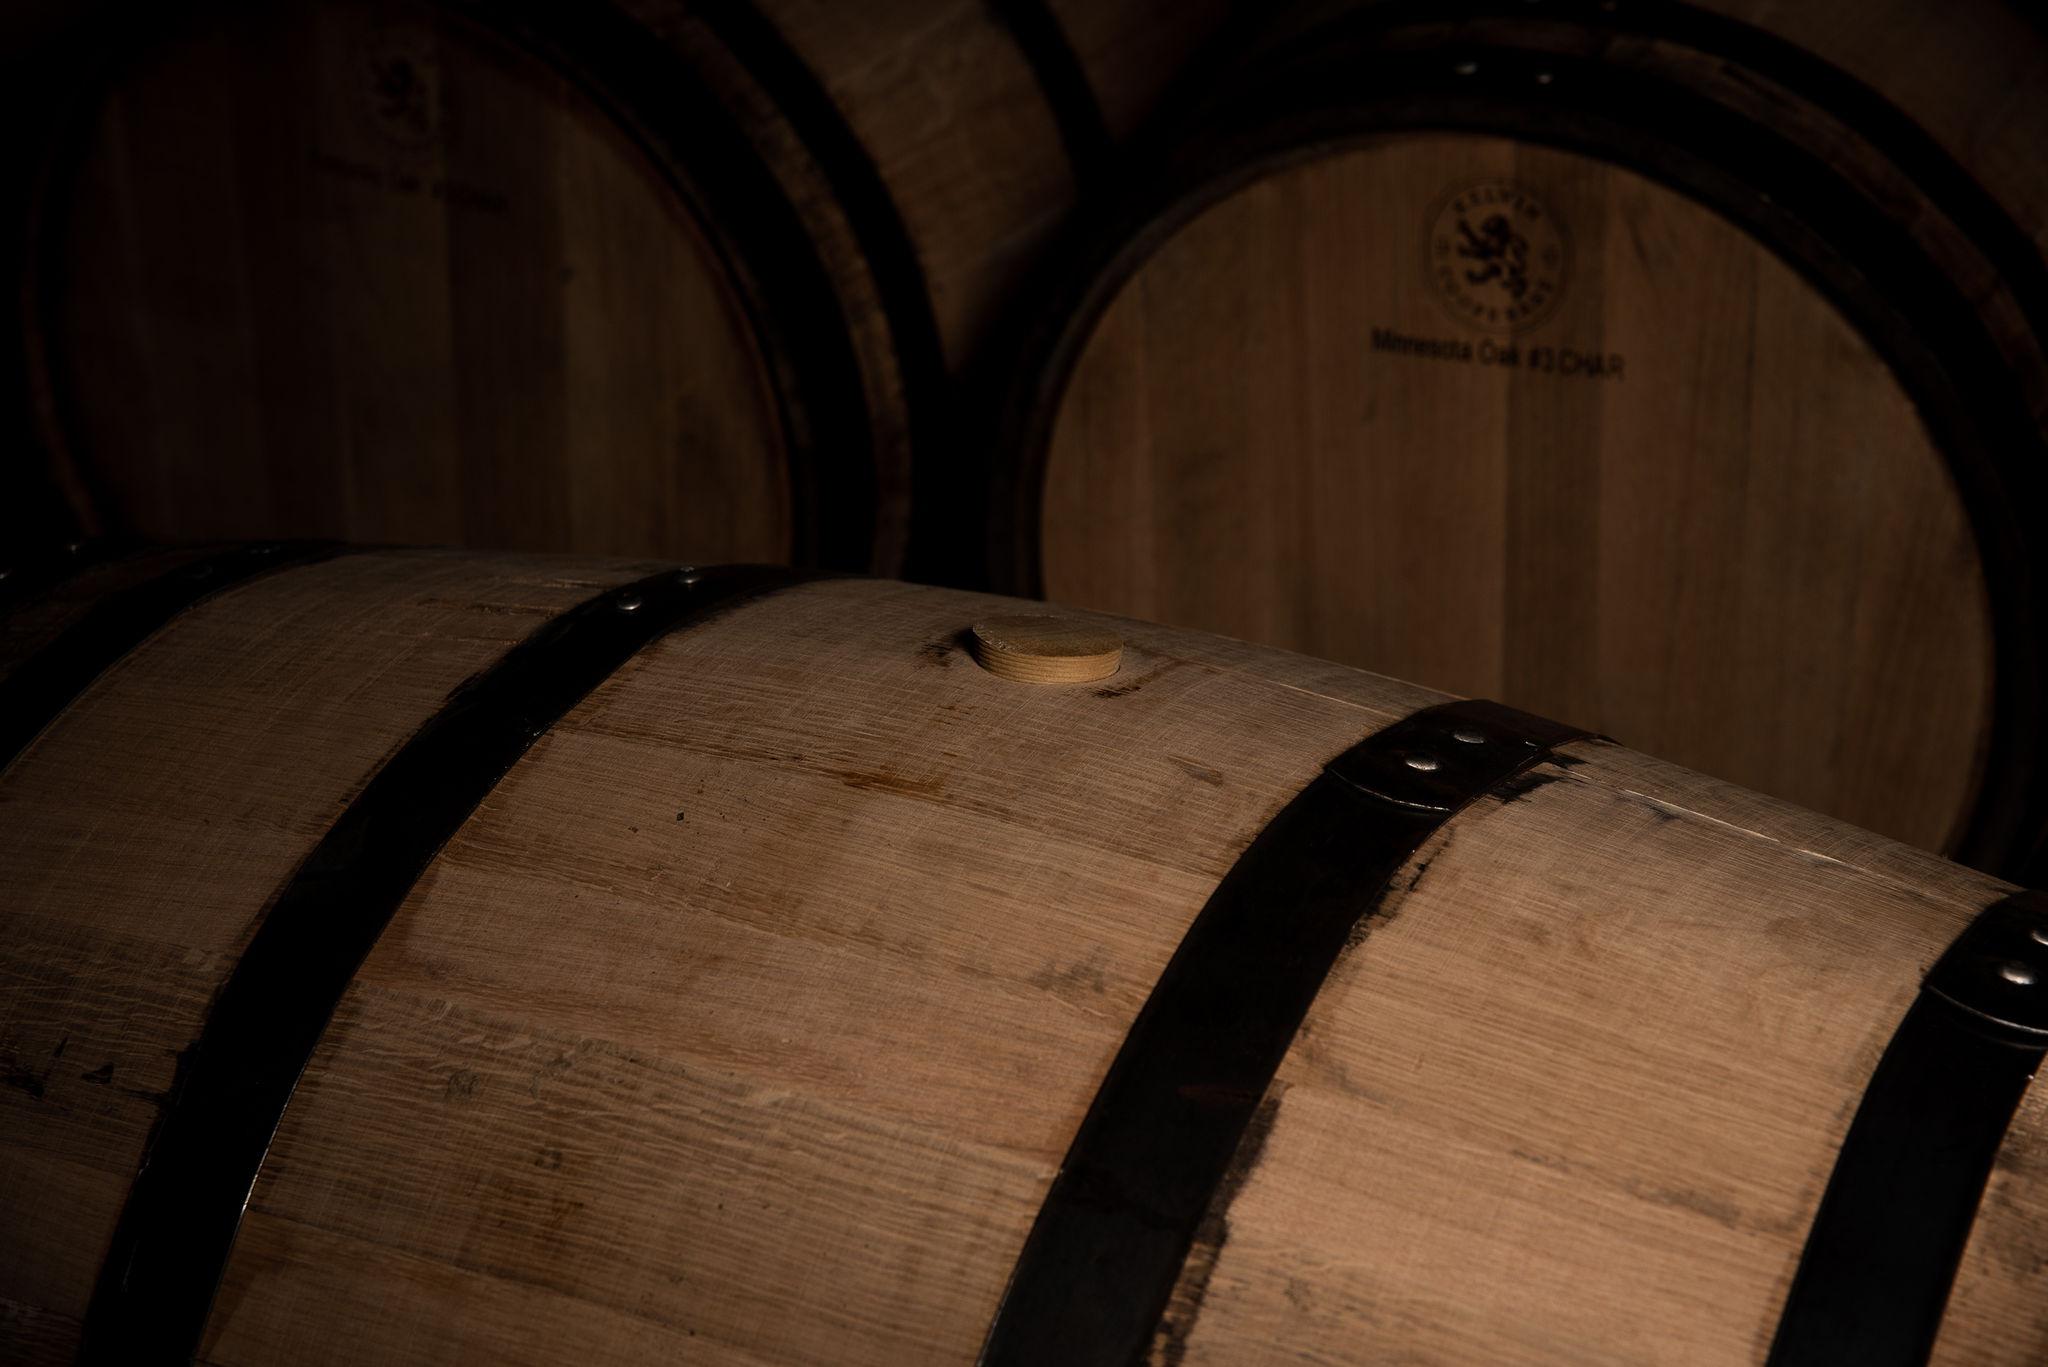 David_Benthal_photography Matchbook Distilling Co.jpg